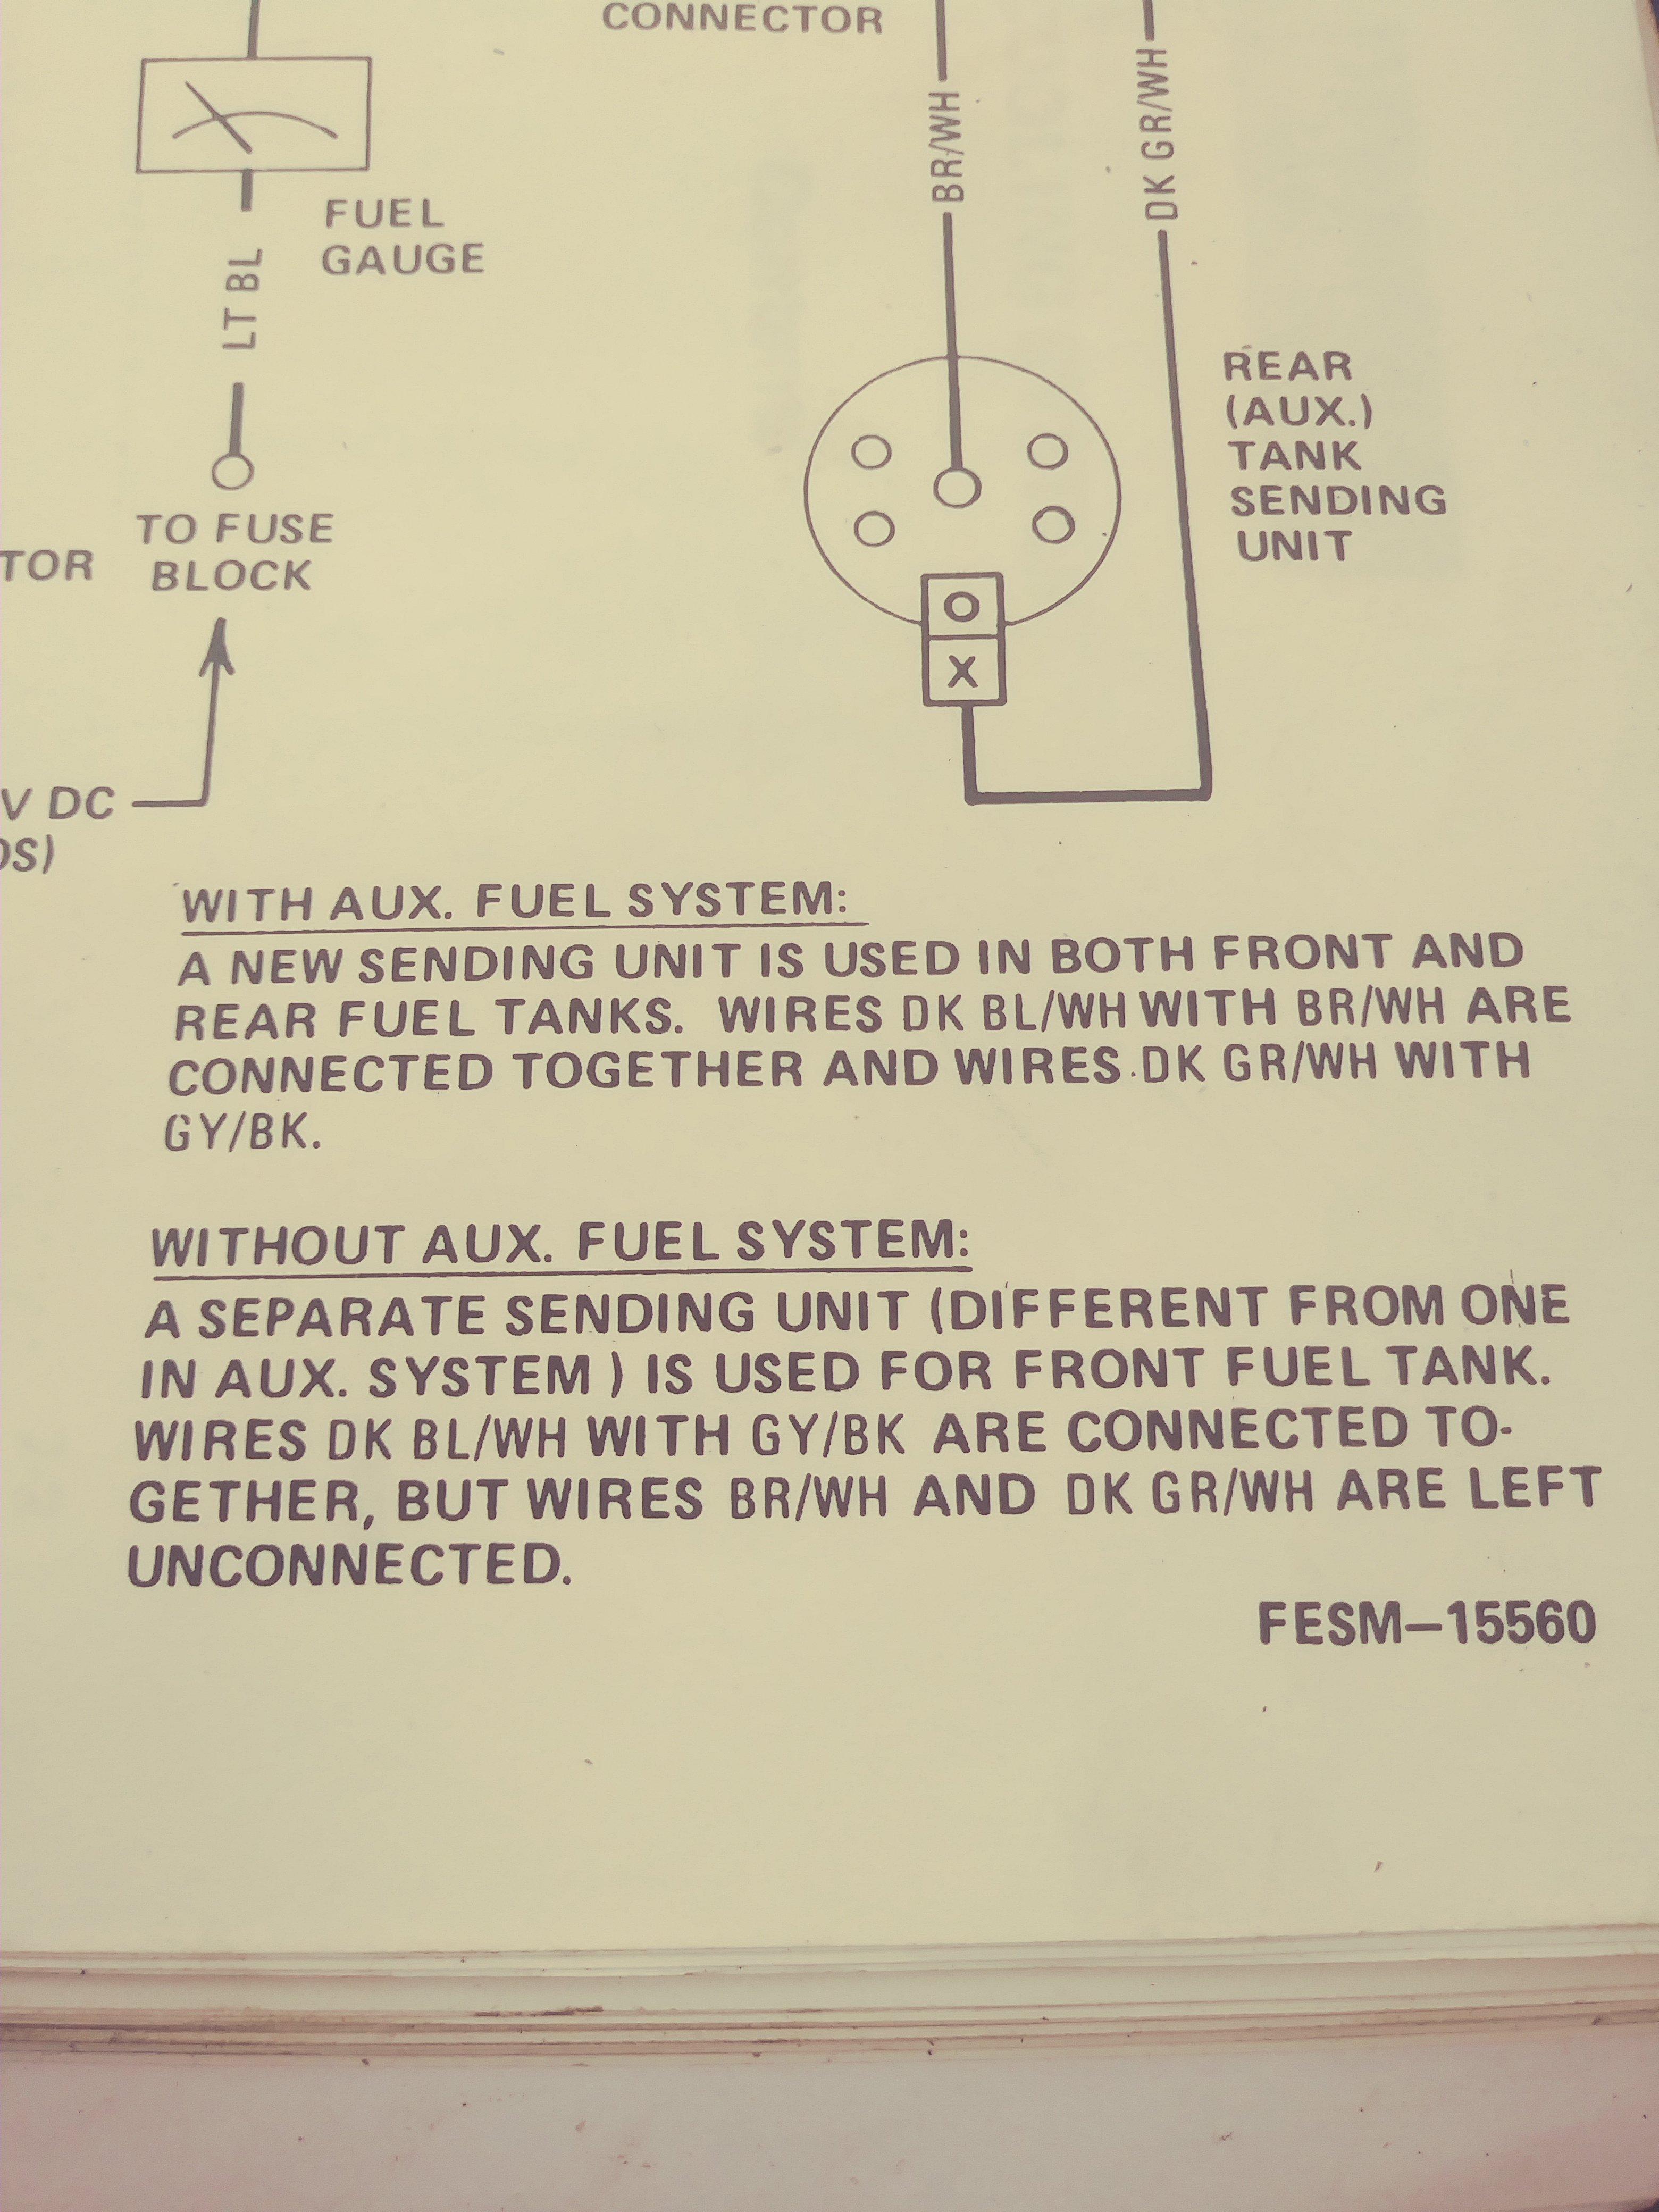 Dc Fuel Gauge Wiring Diagram | Wiring Liry Dc Fuel Gauge Wiring Diagram on